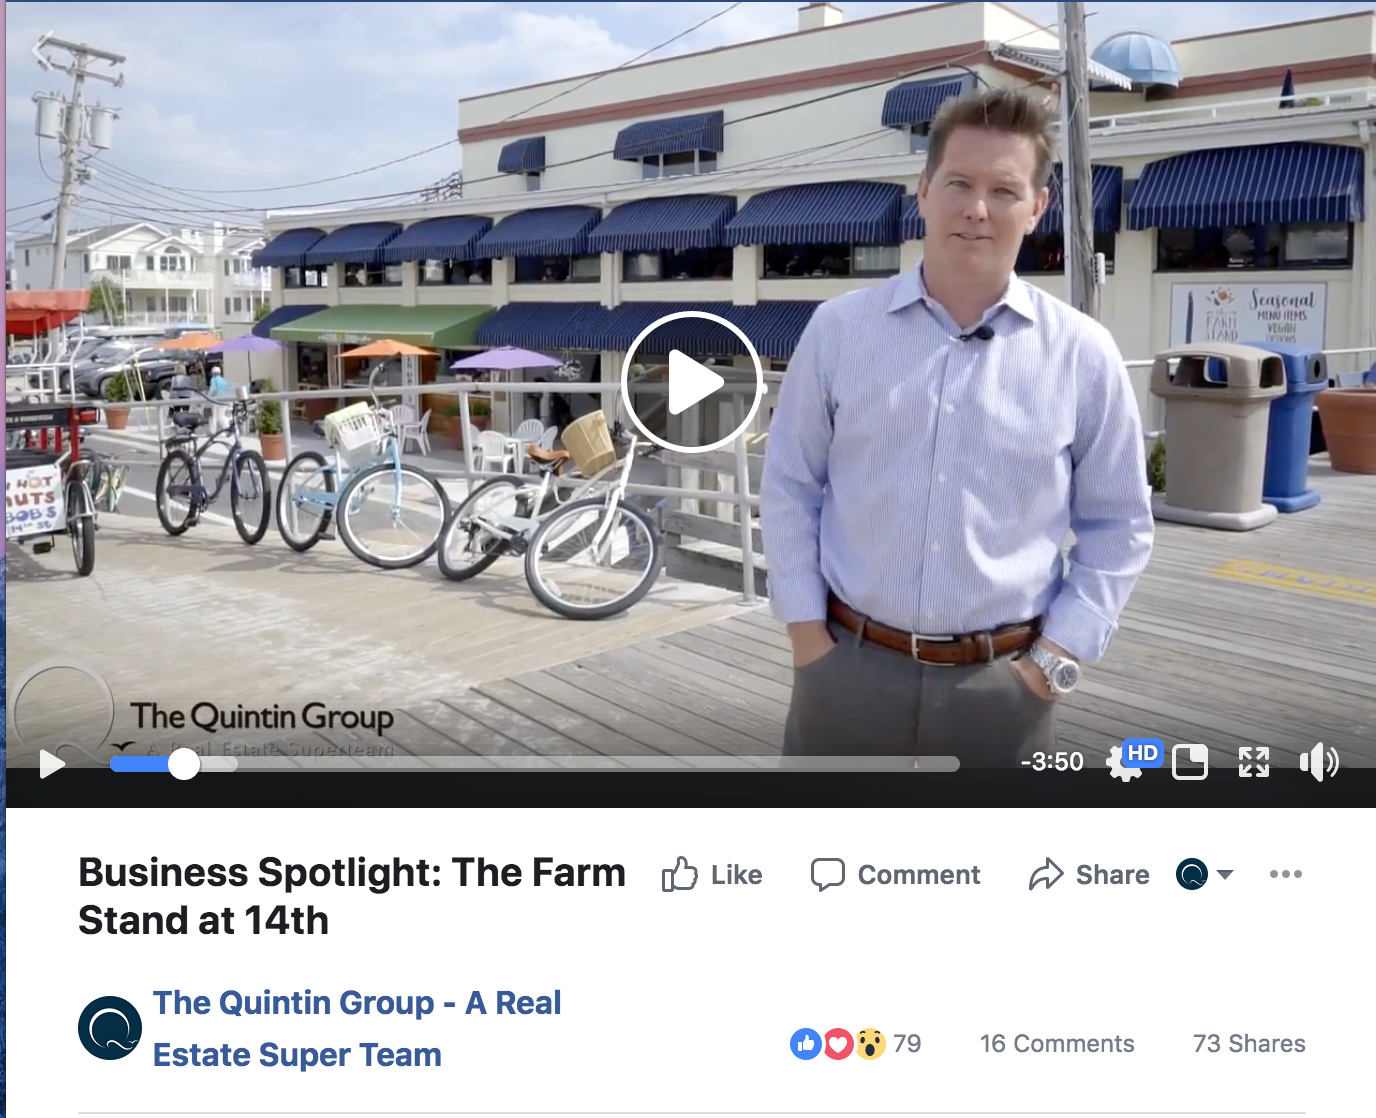 Jeff Quintin Business Spotlight video